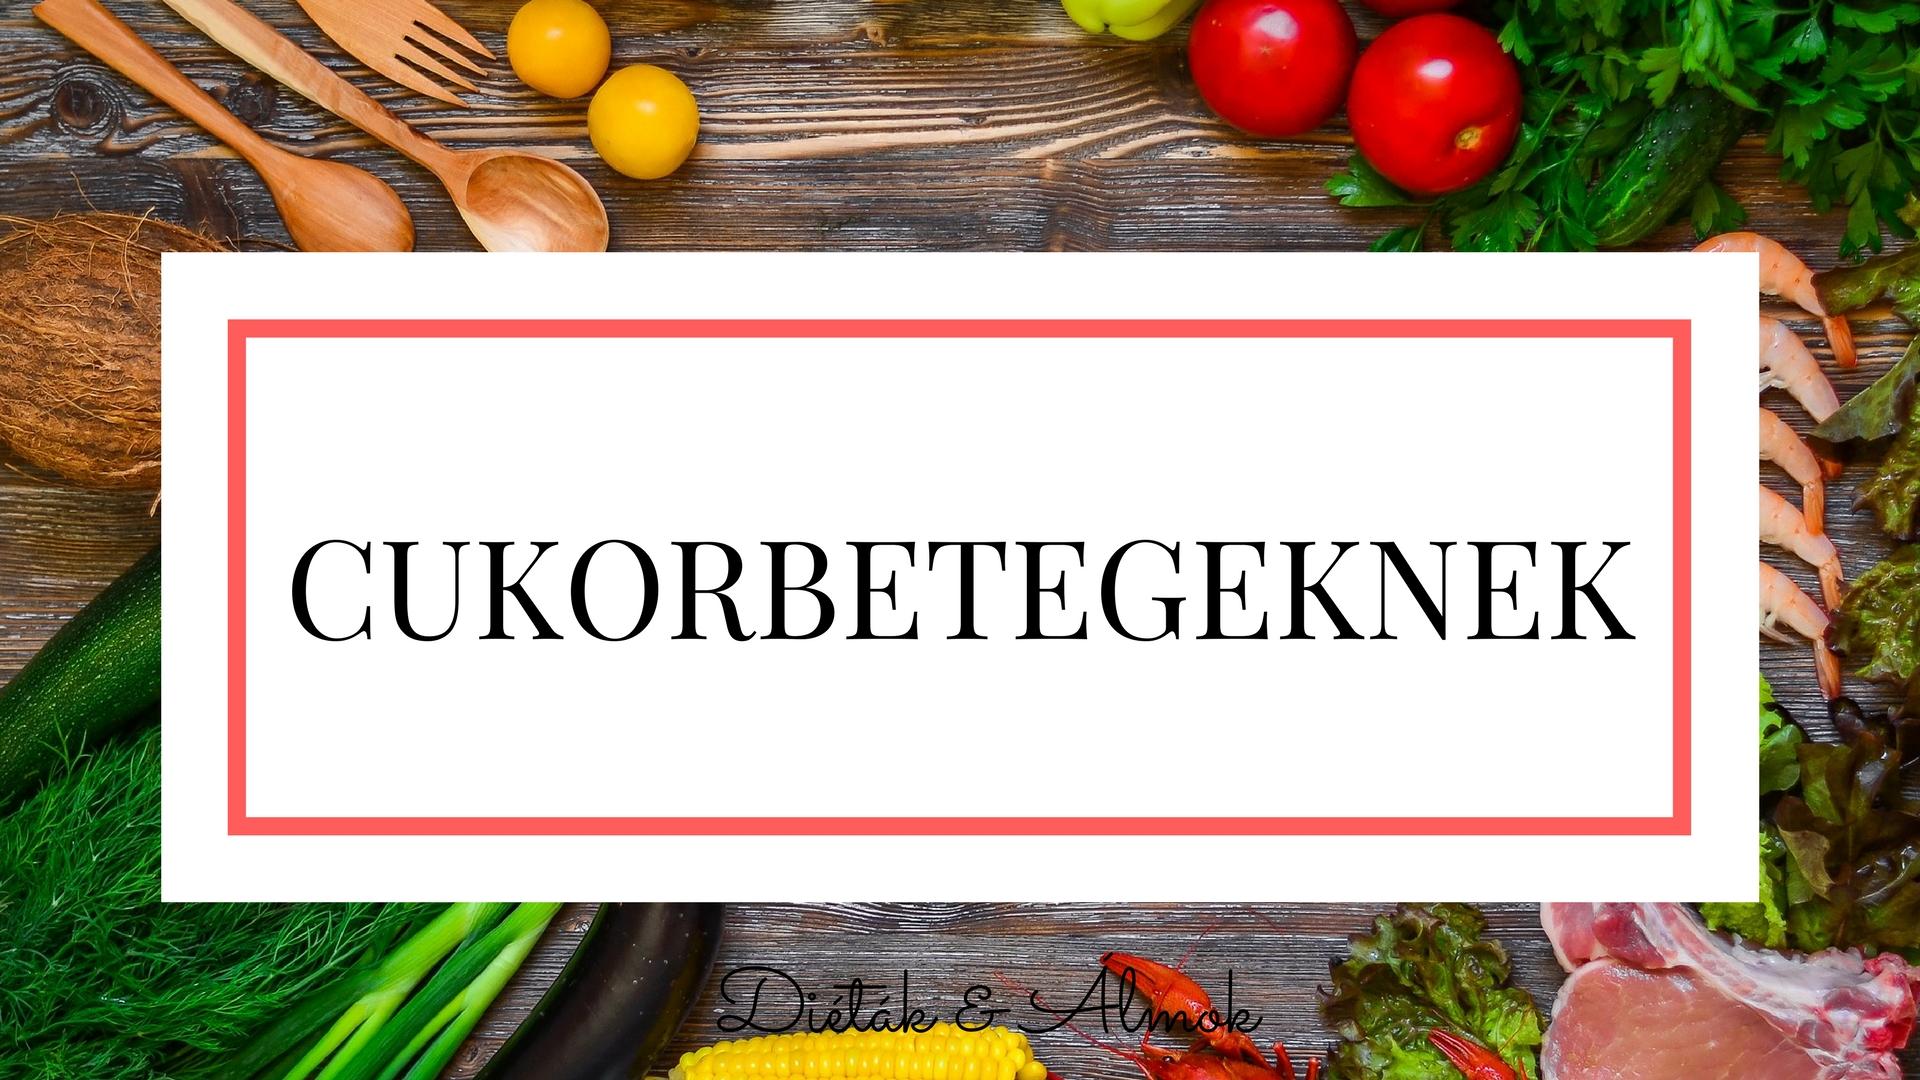 dietak_almok_szenhidrat_dieta_cukorbetegseg_blog.jpg